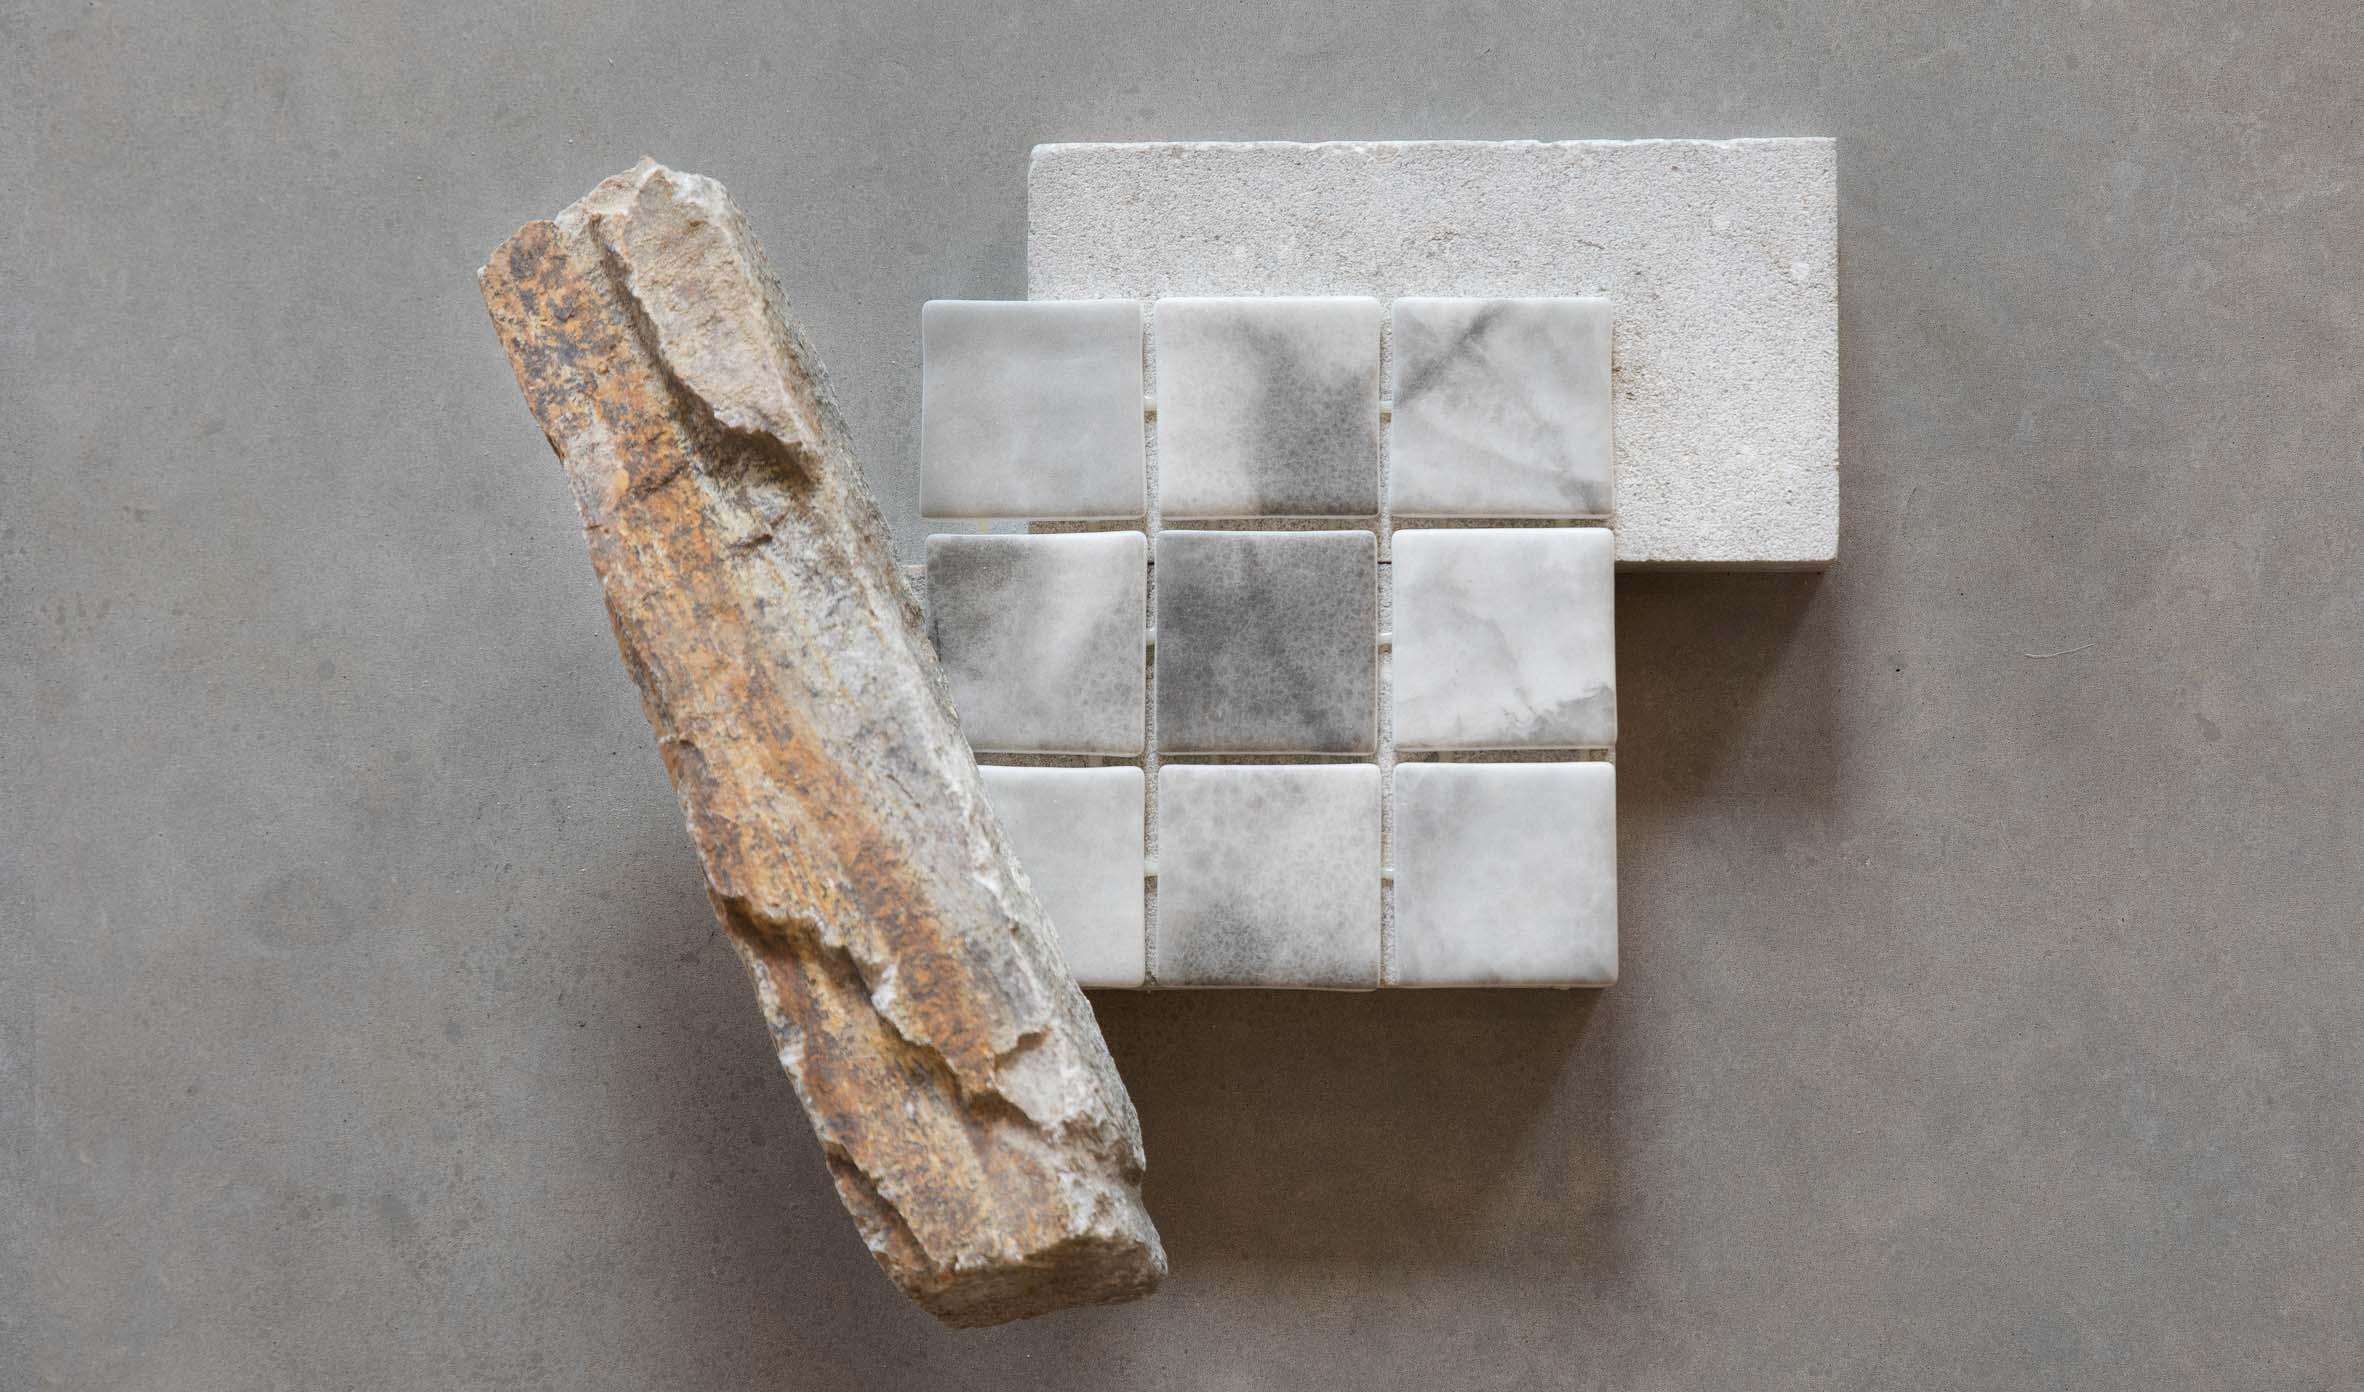 Pool-Tiles Thumbnails pool-tiles-01